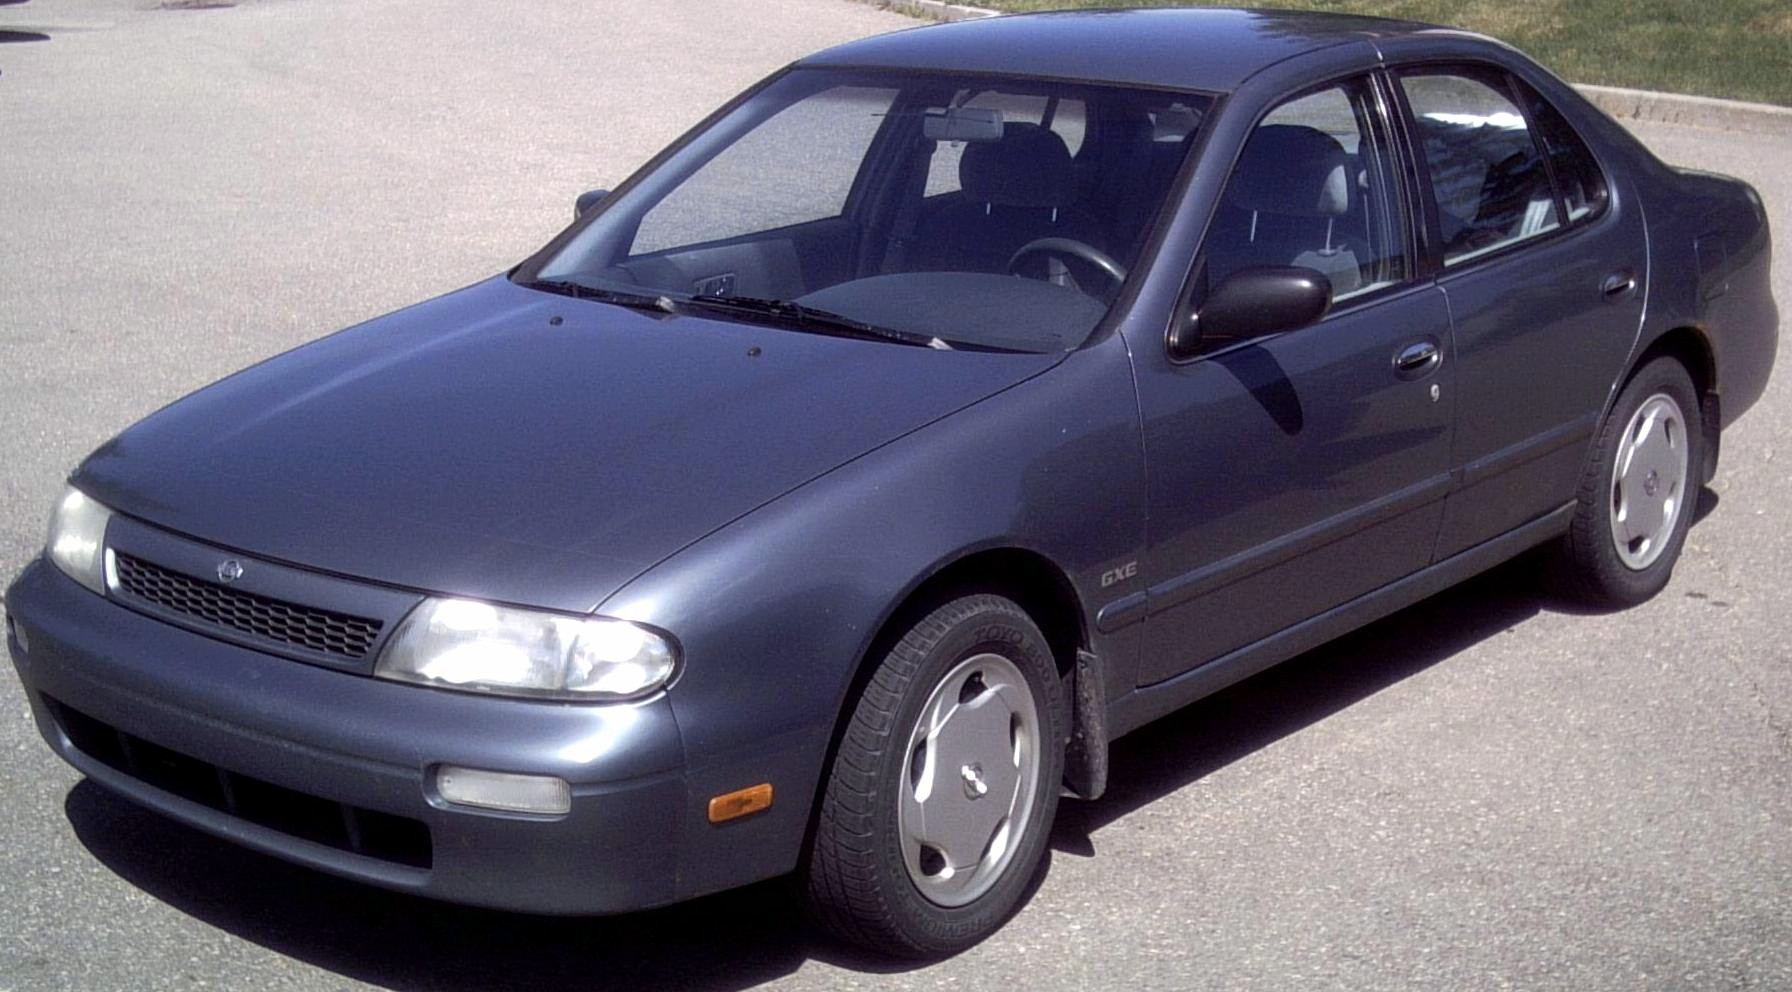 1993 Nissan Altima Image 10